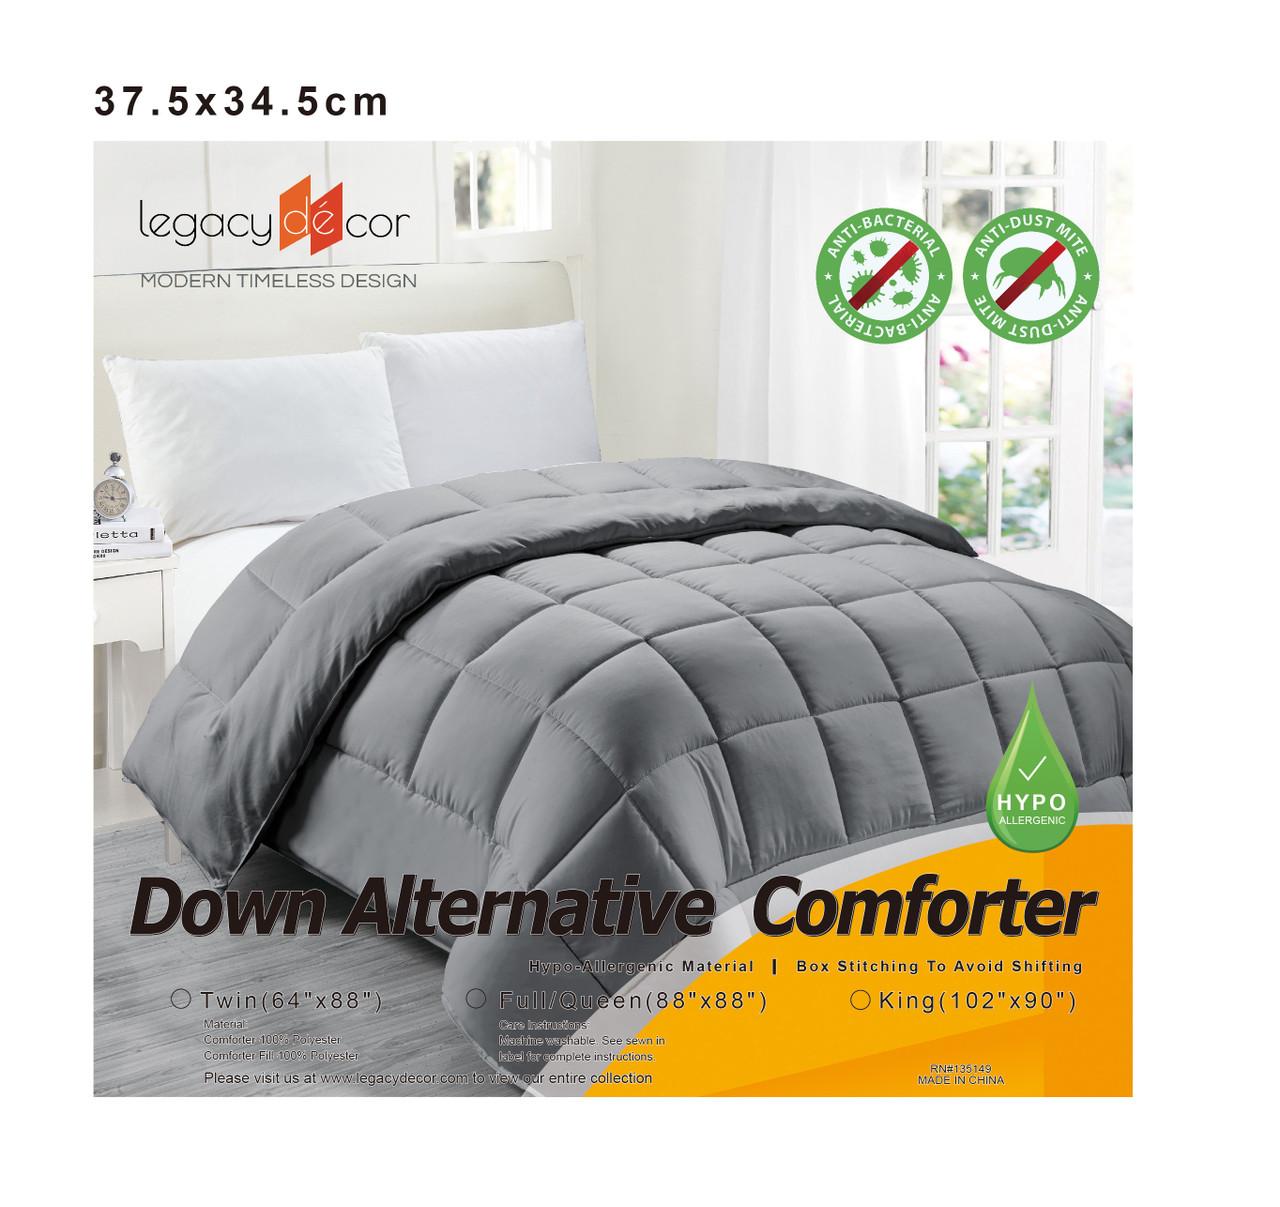 Down Alternative Hypoallergenic Comforter Grey Color